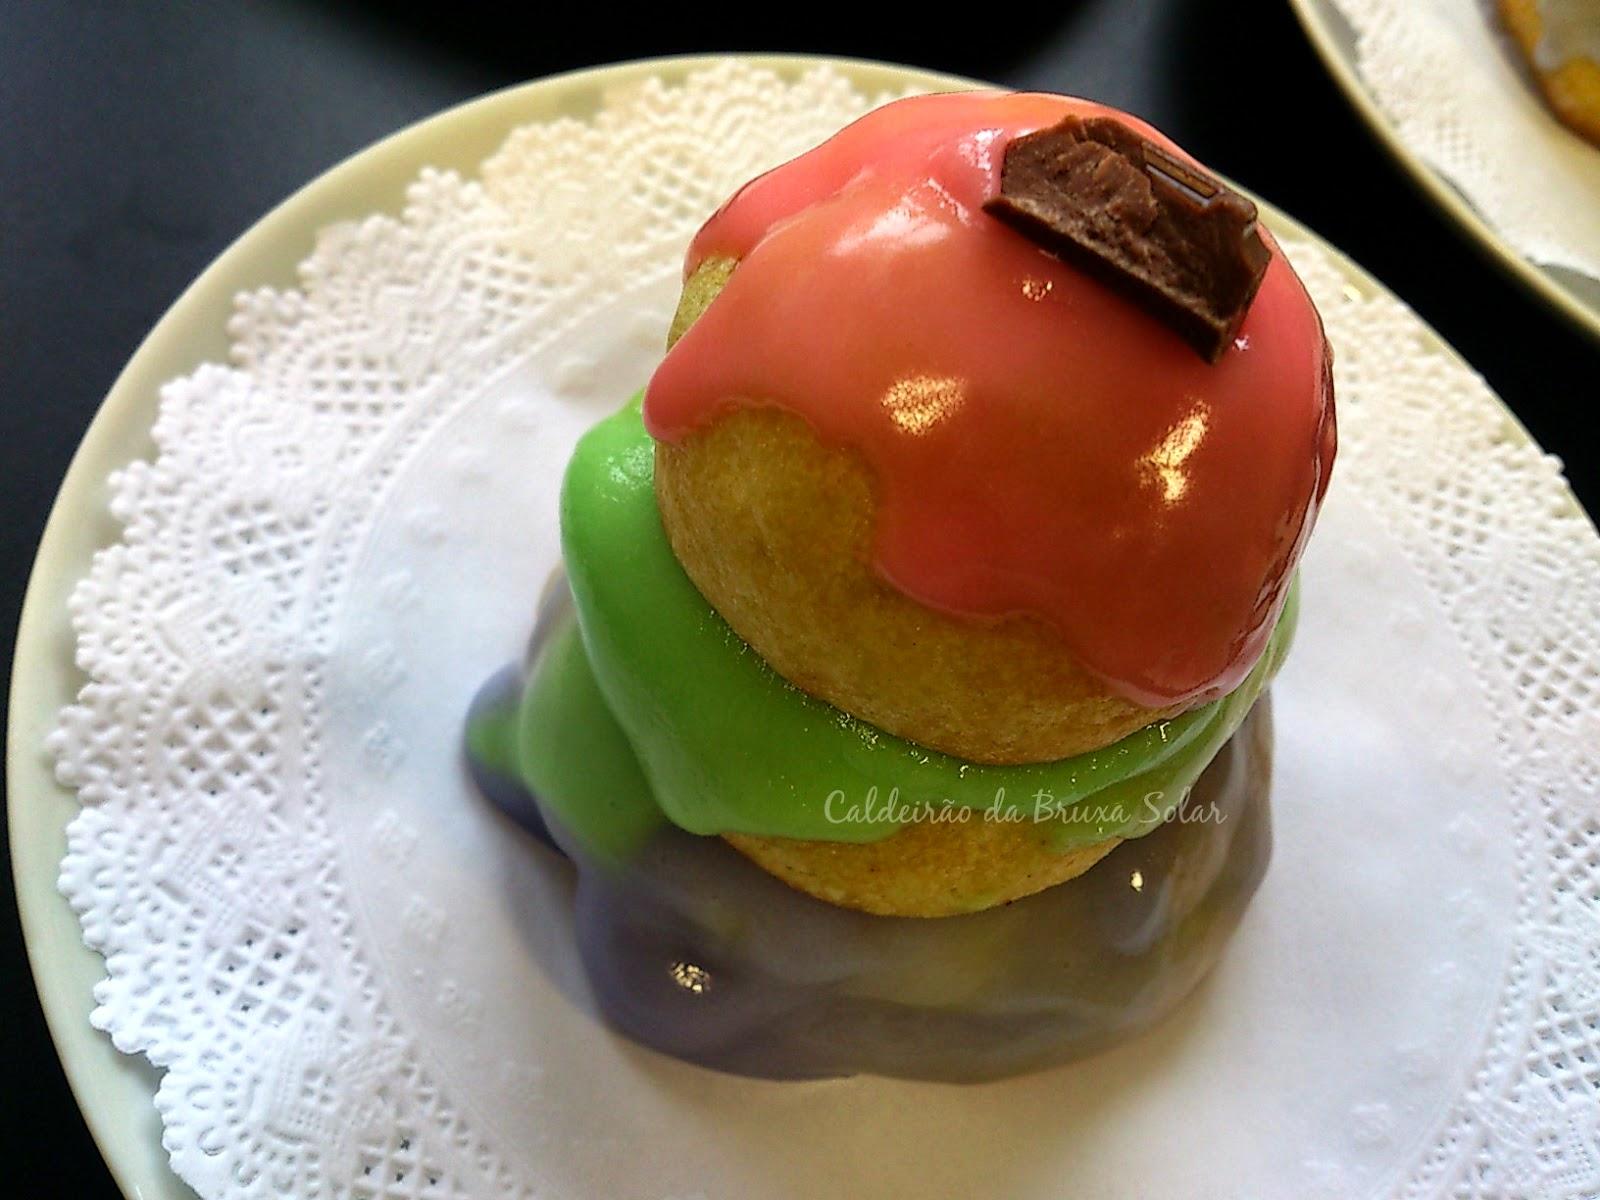 Mendl's Courtesan au Chocolat